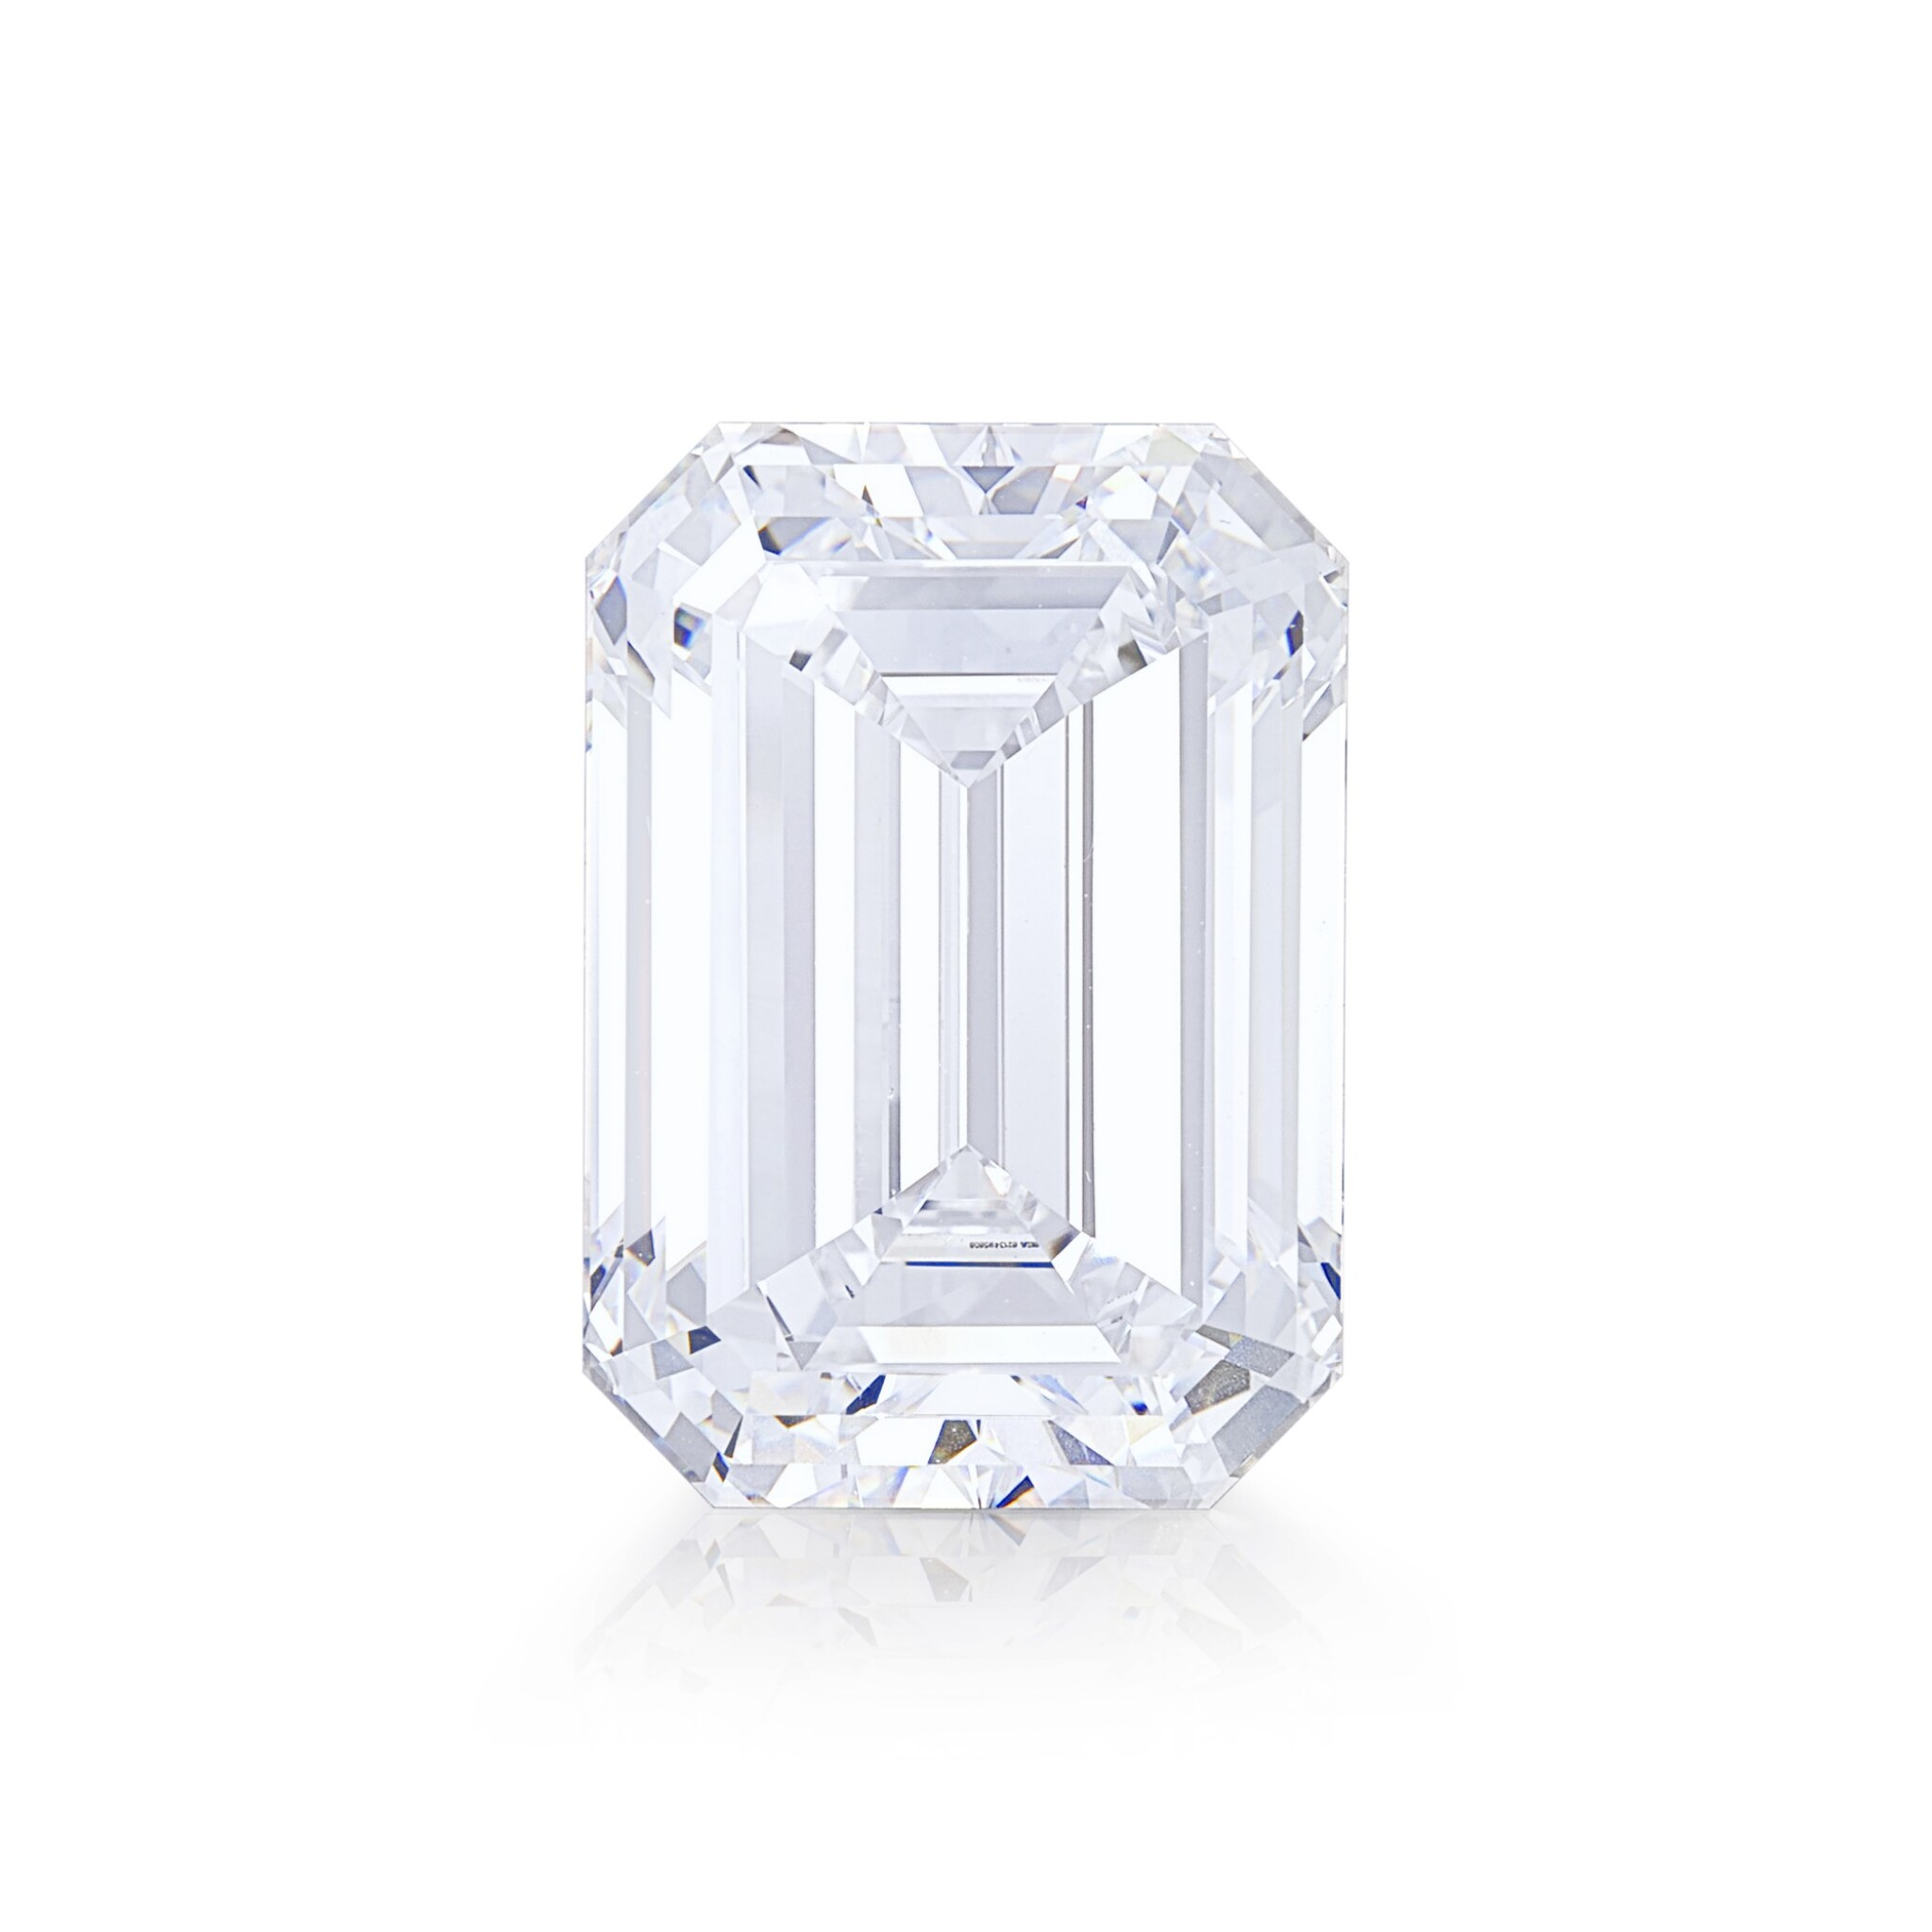 View full screen - View 1 of Lot 8002. Unmounted Diamond   10.88克拉 方形 D色 完美無瑕 鑽石.